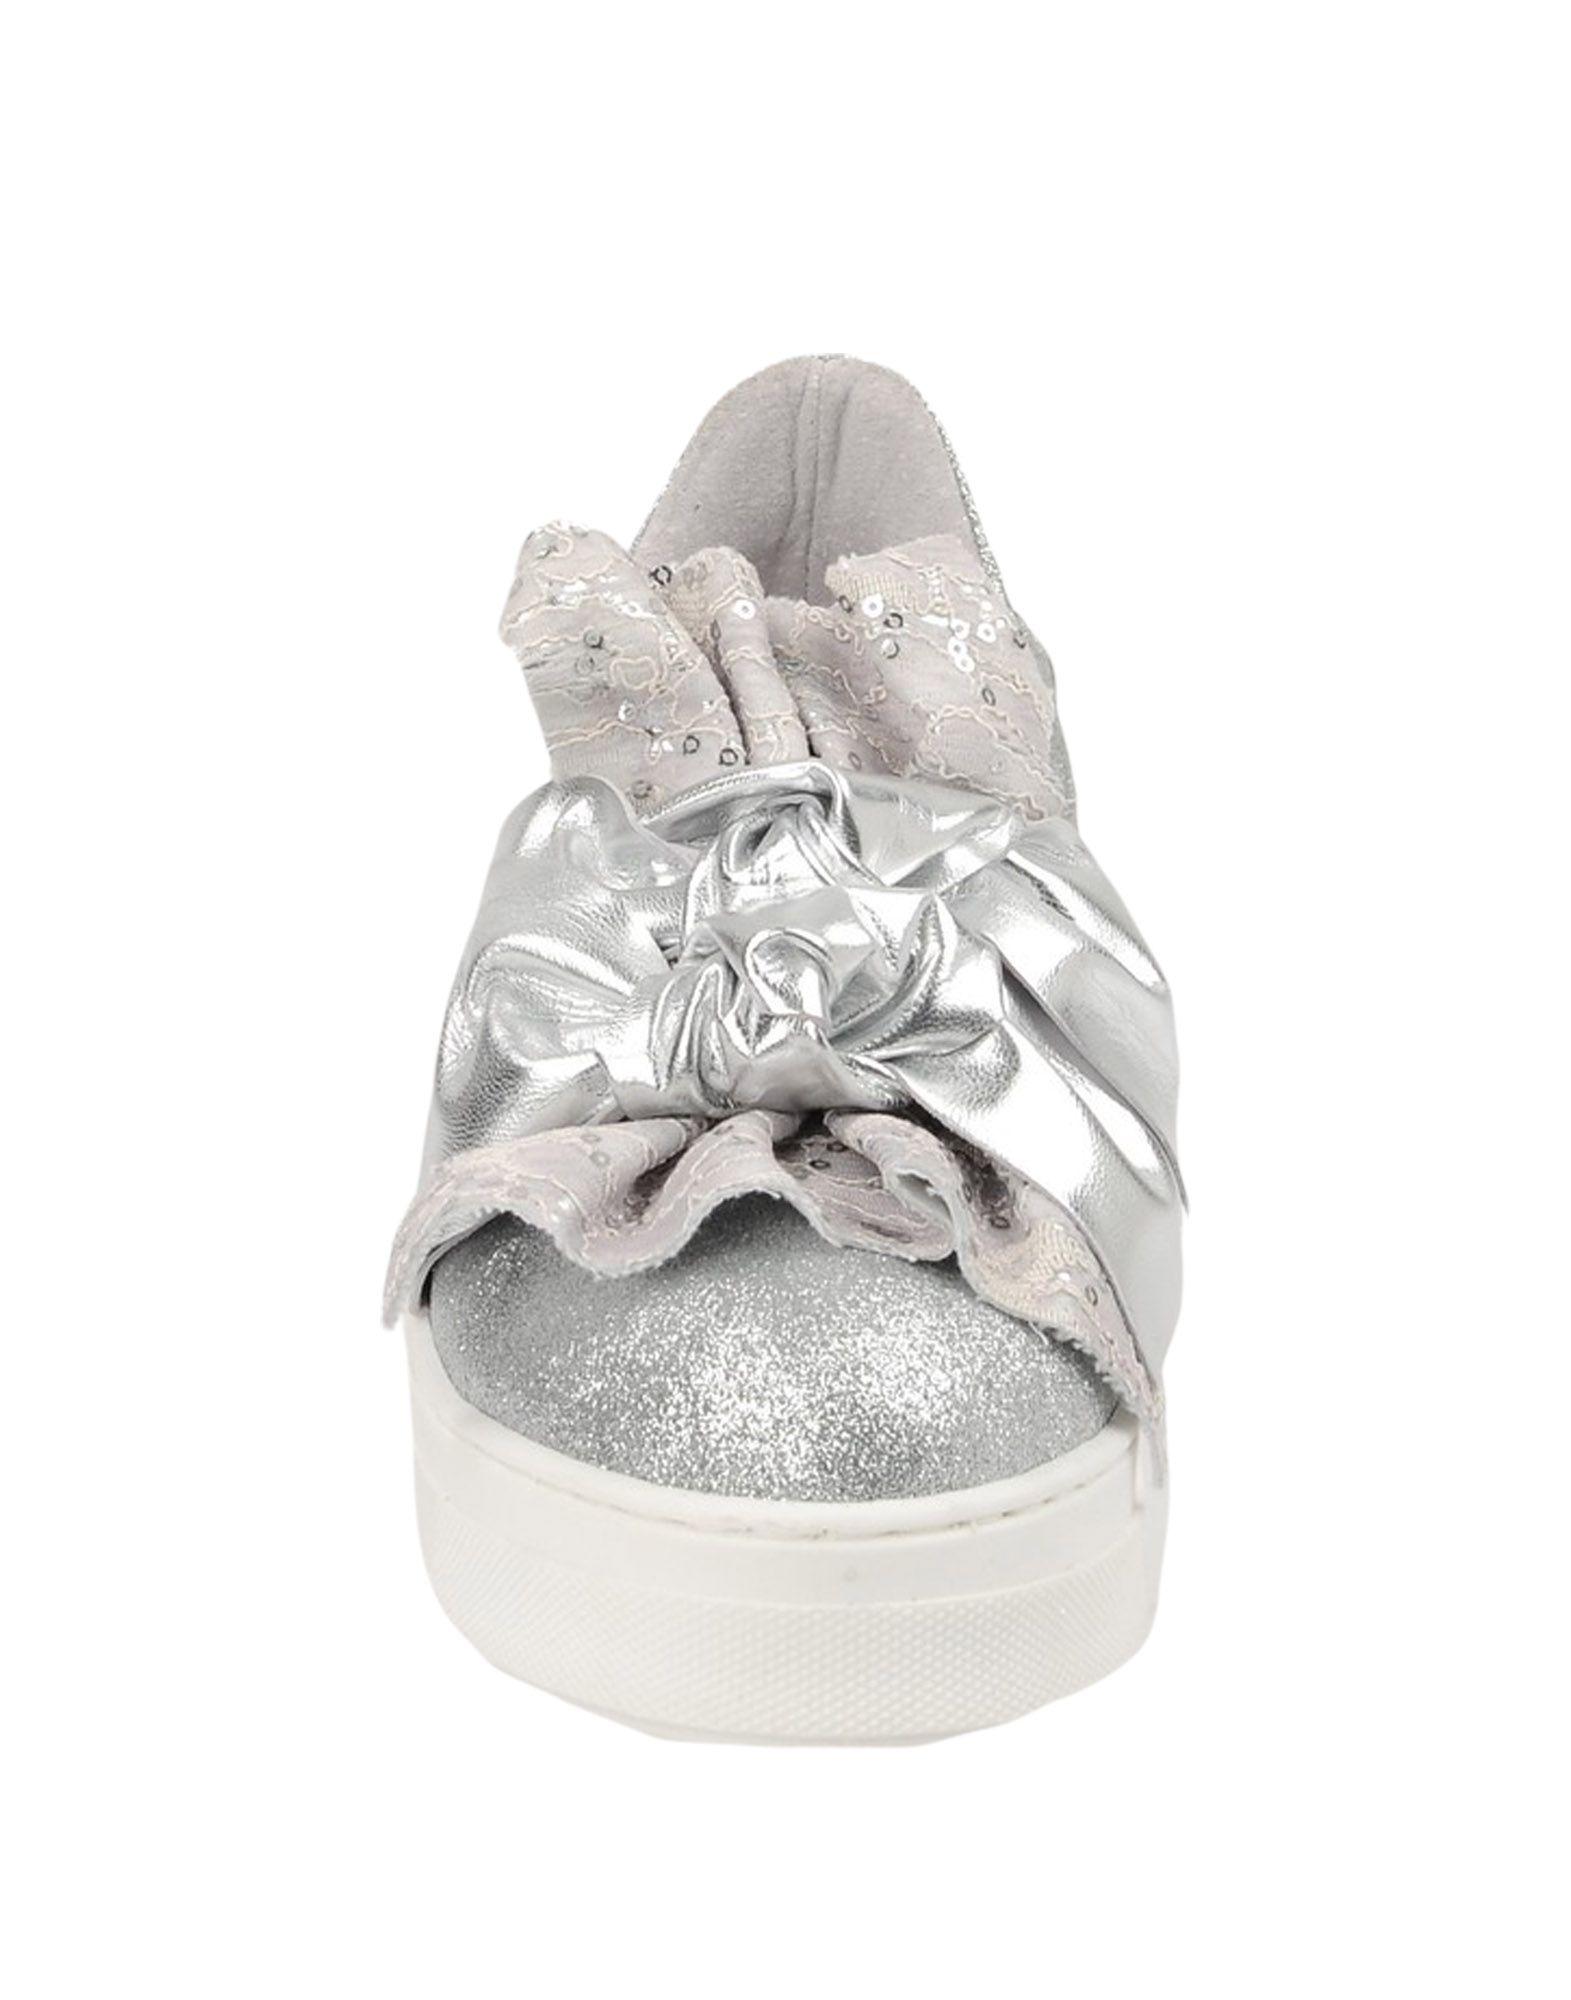 Get It Sneakers Damen beliebte  11436854MS Gute Qualität beliebte Damen Schuhe 558db6